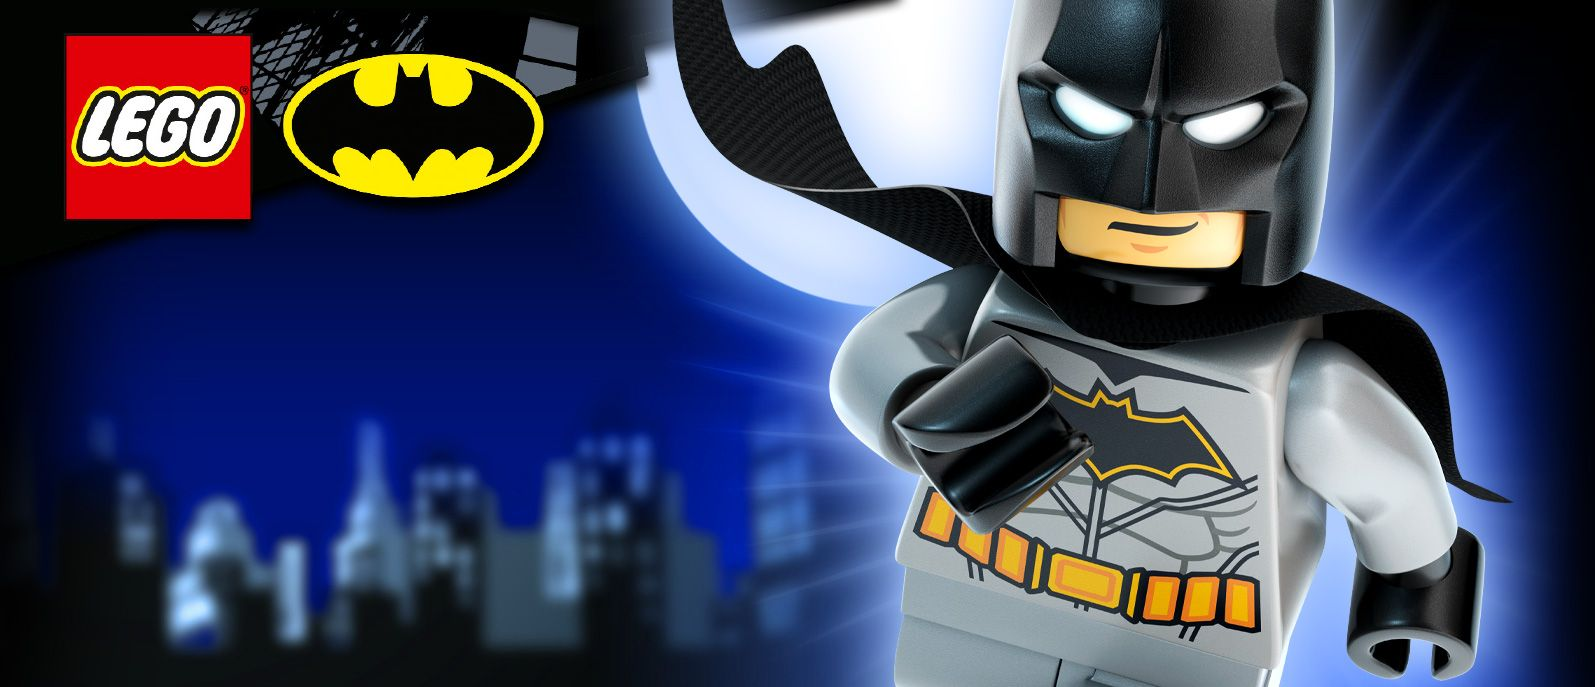 Batman <br>is coming…